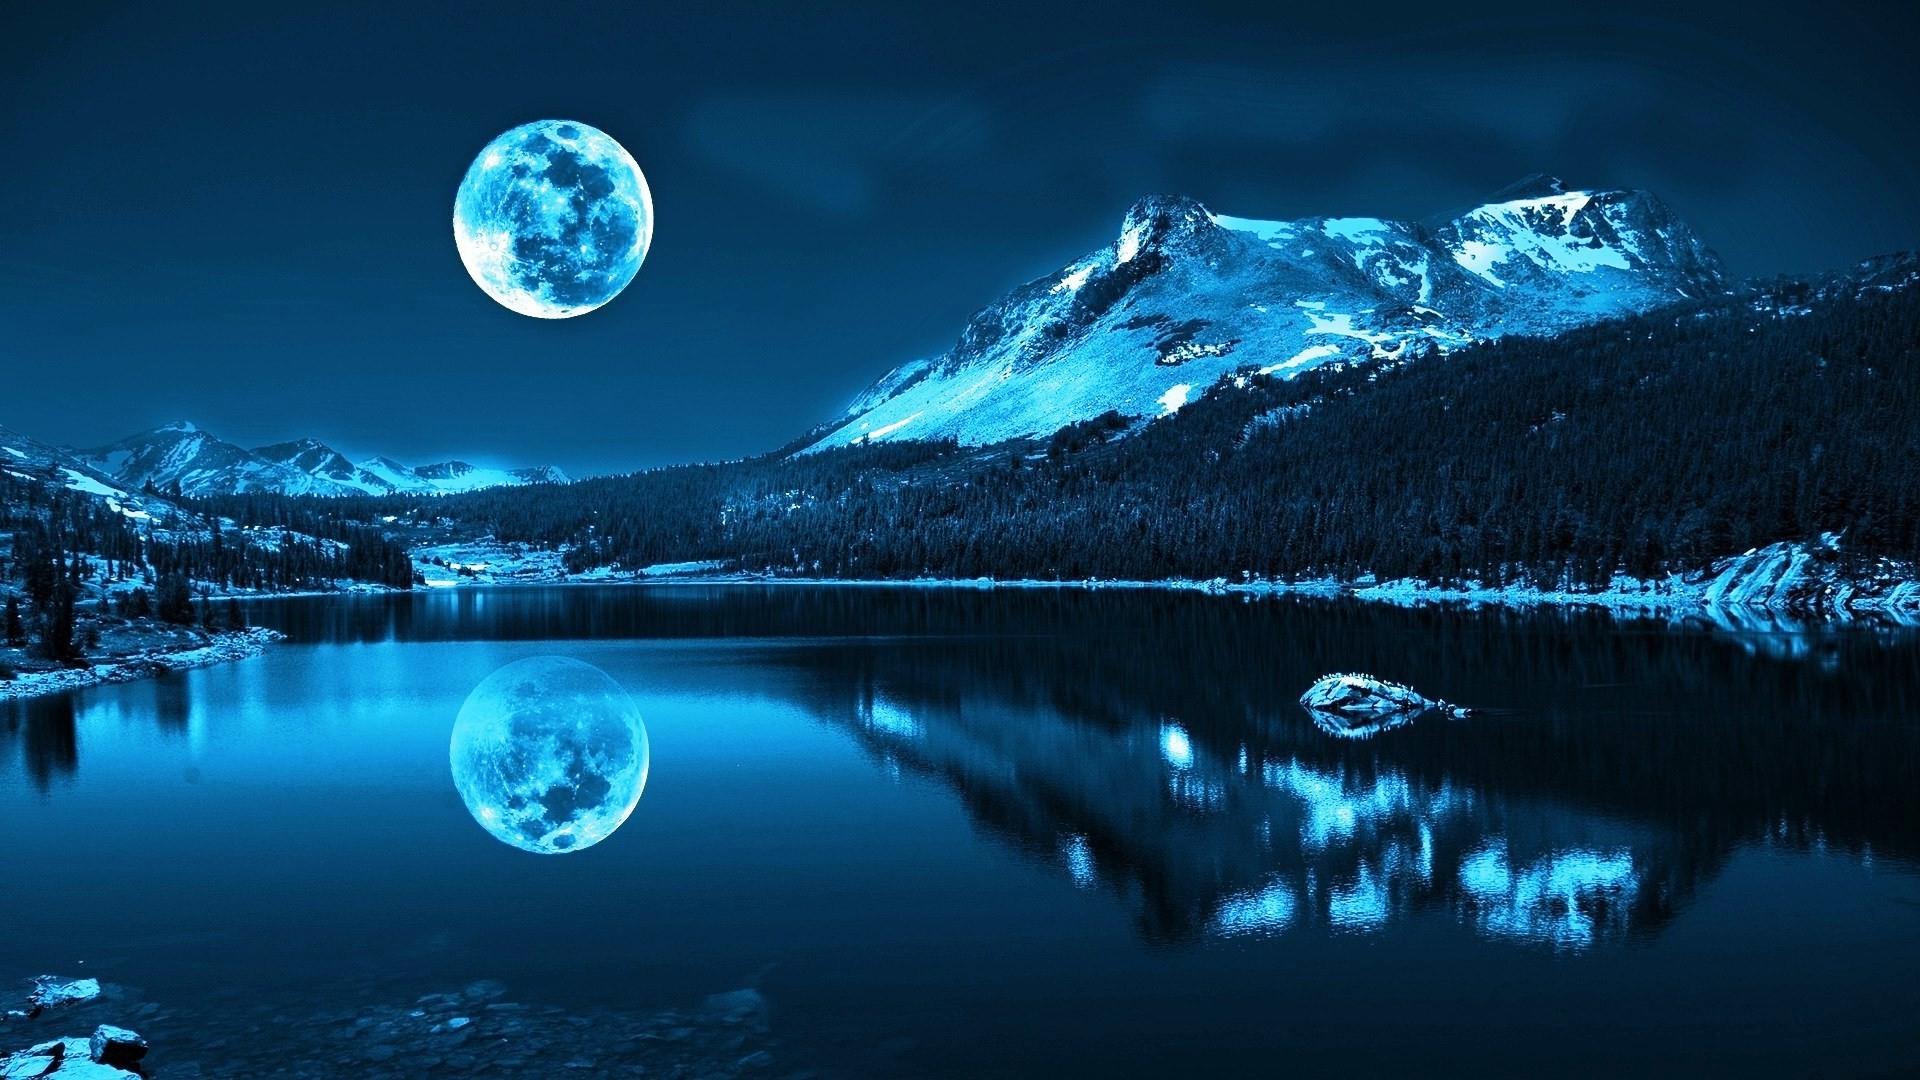 شب مهتاب صائب